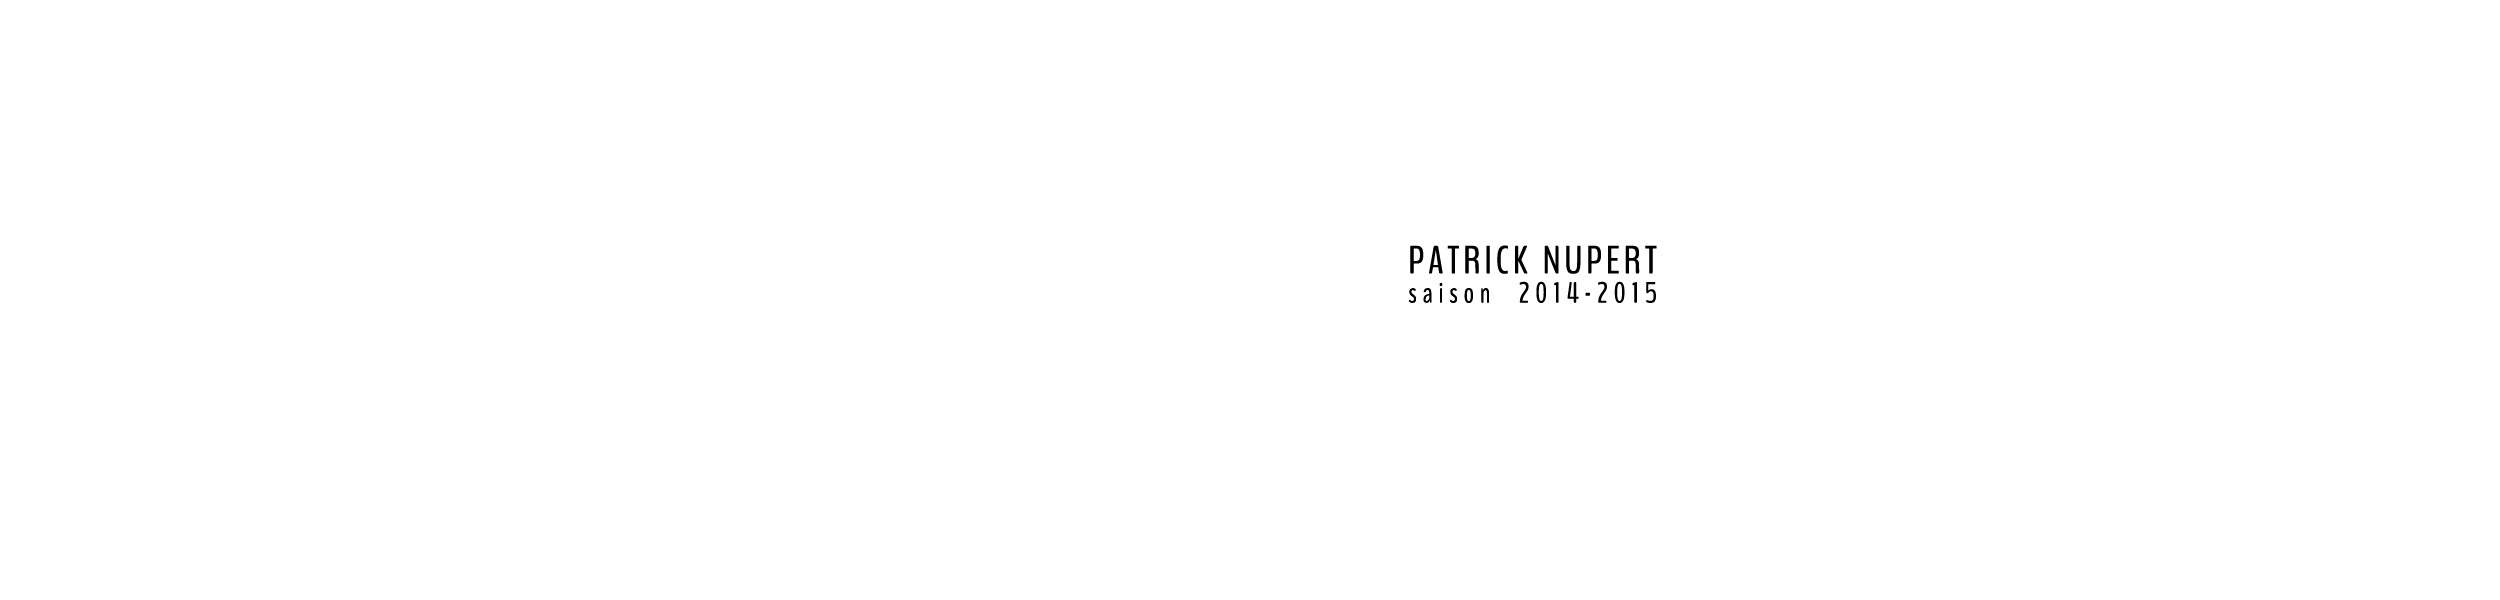 2016 Nike Zoom KD IV 4 N7 Noir 519567 046 Noir foncé